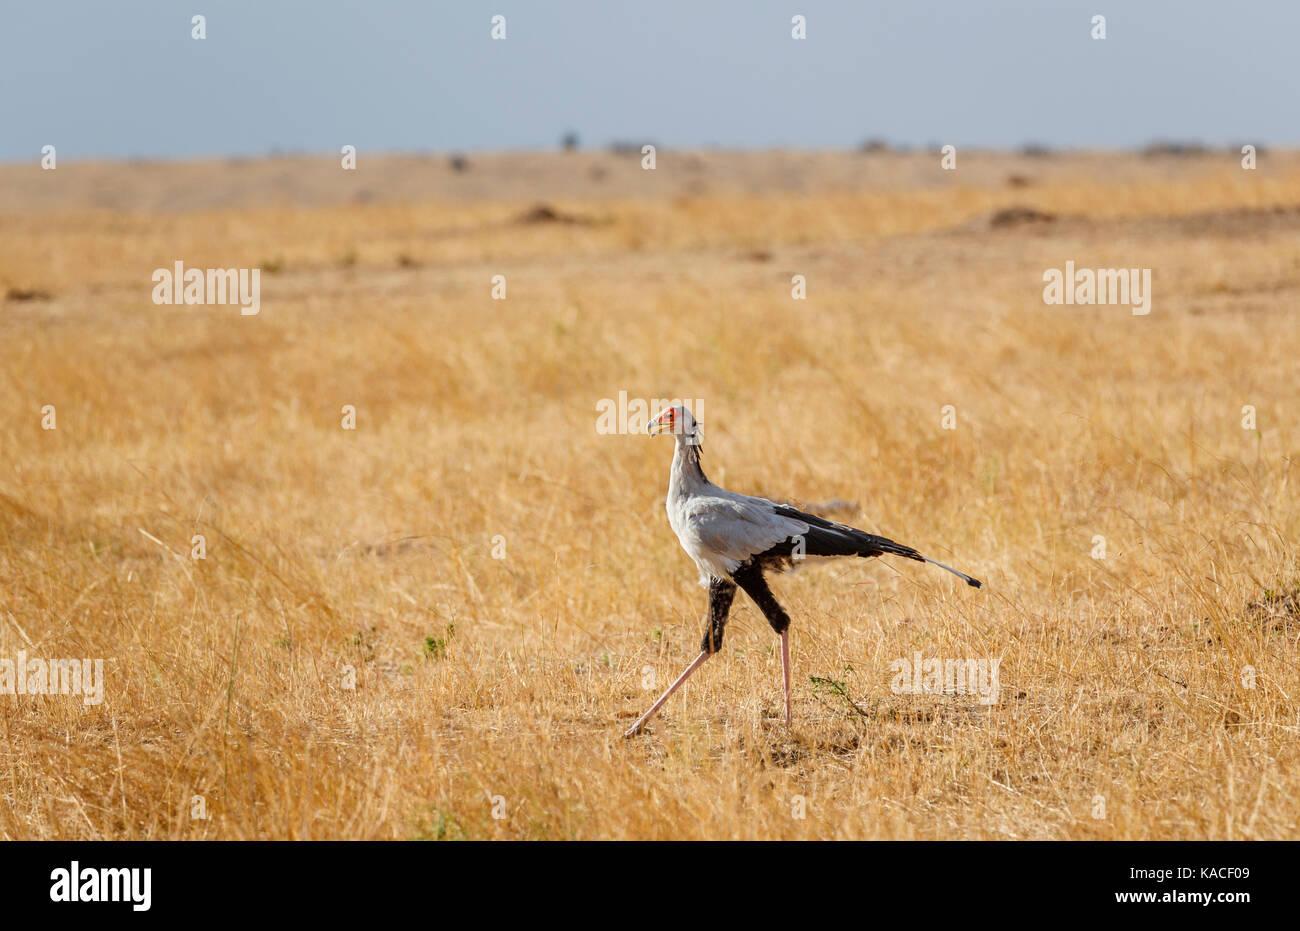 Sagittarius serpentarius, secretarybird, an unusual tall bird of prey standing in savannah grassland, Masai Mara, Stock Photo